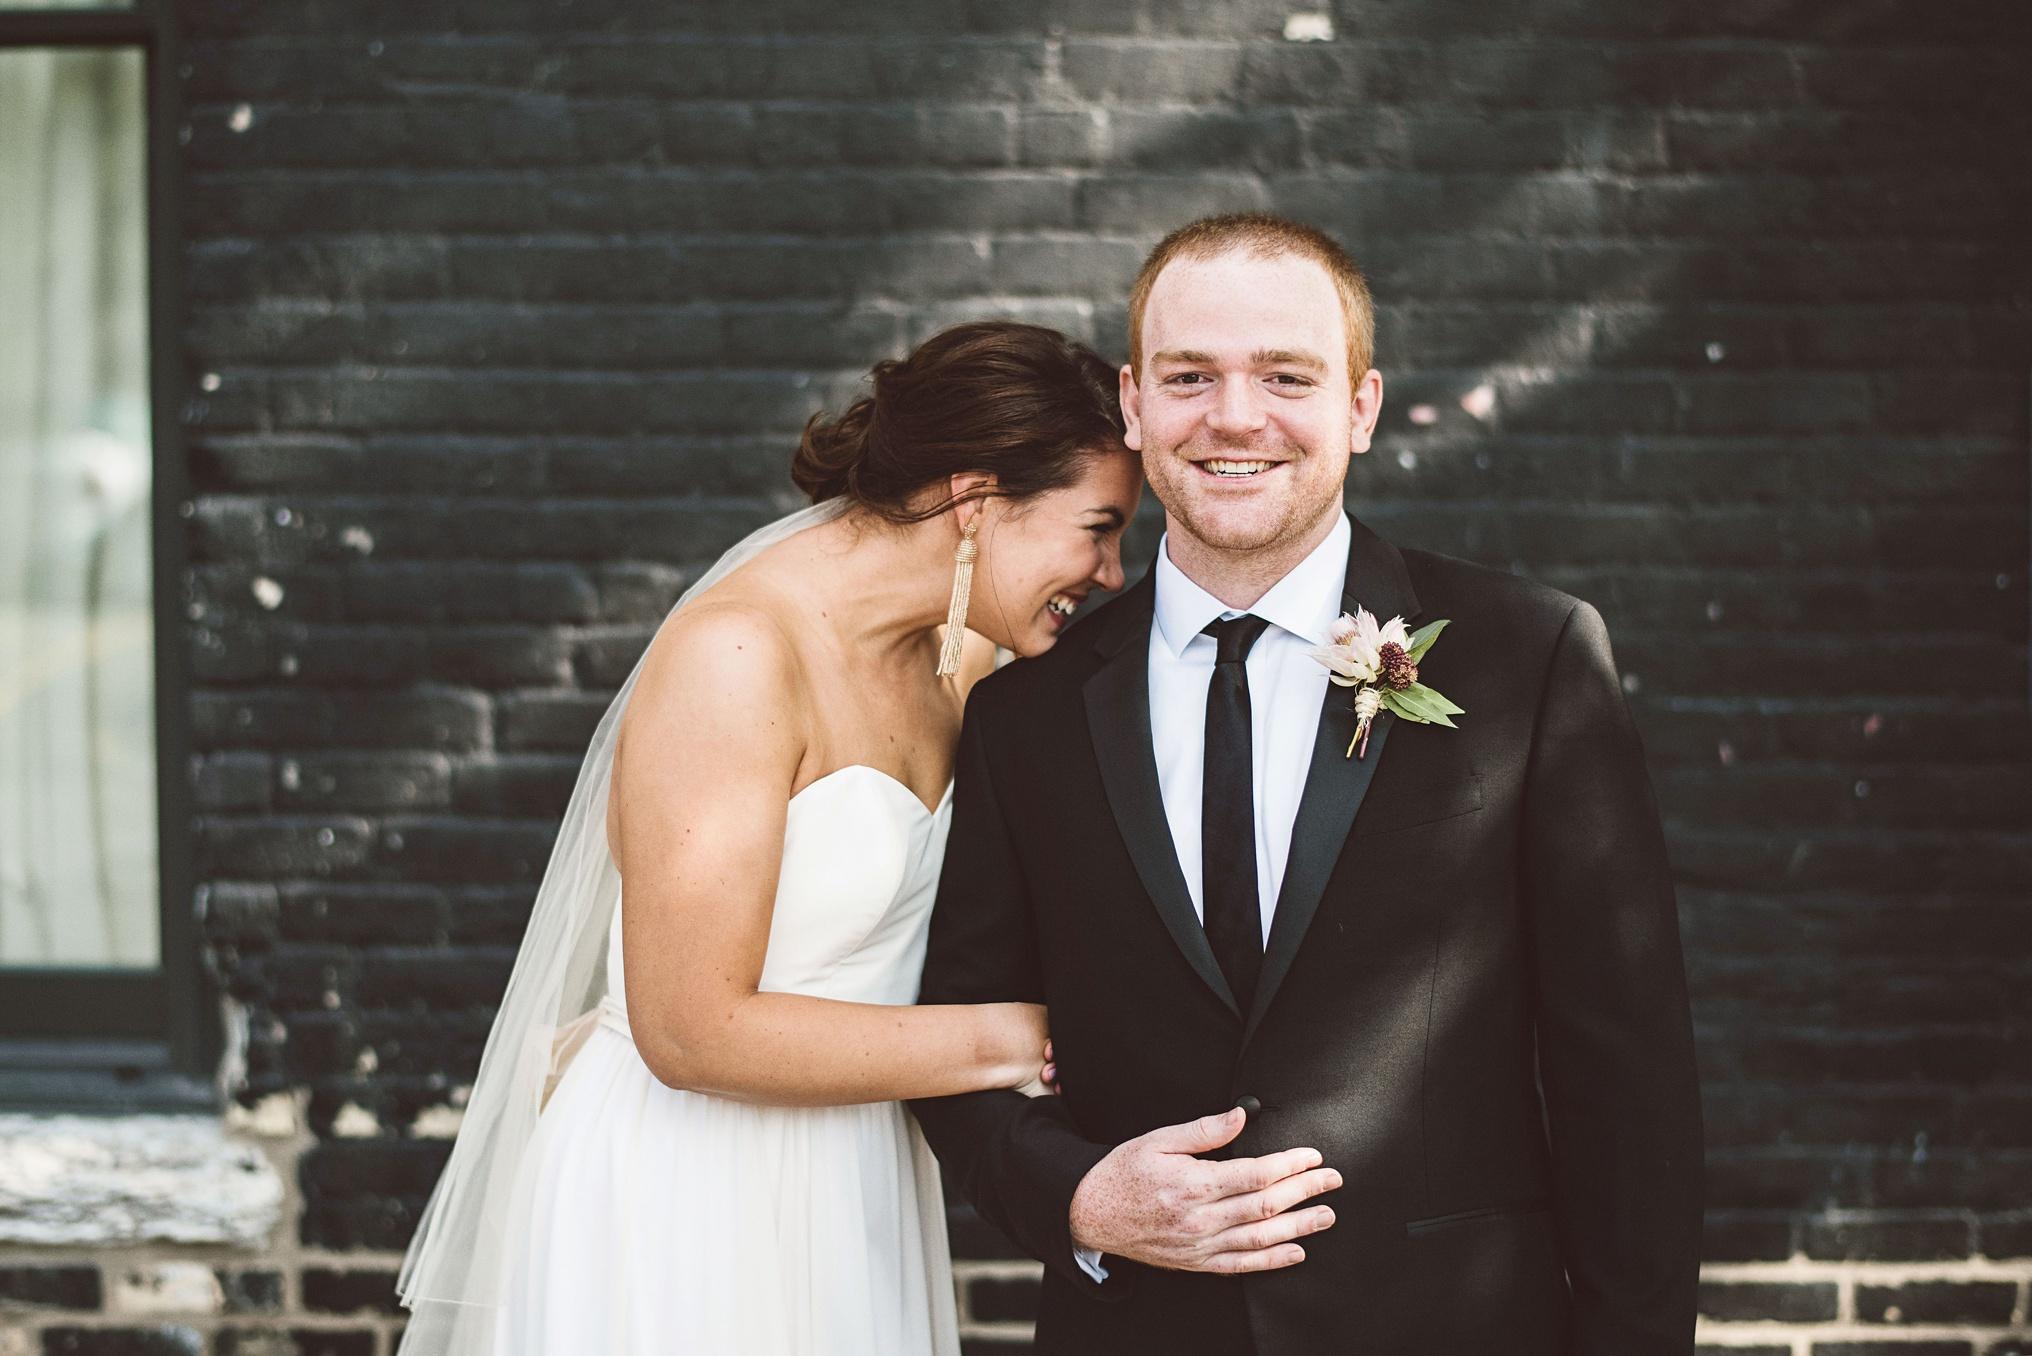 best_wedding_photography_2017_by_lucas_botz_photography_164.jpg